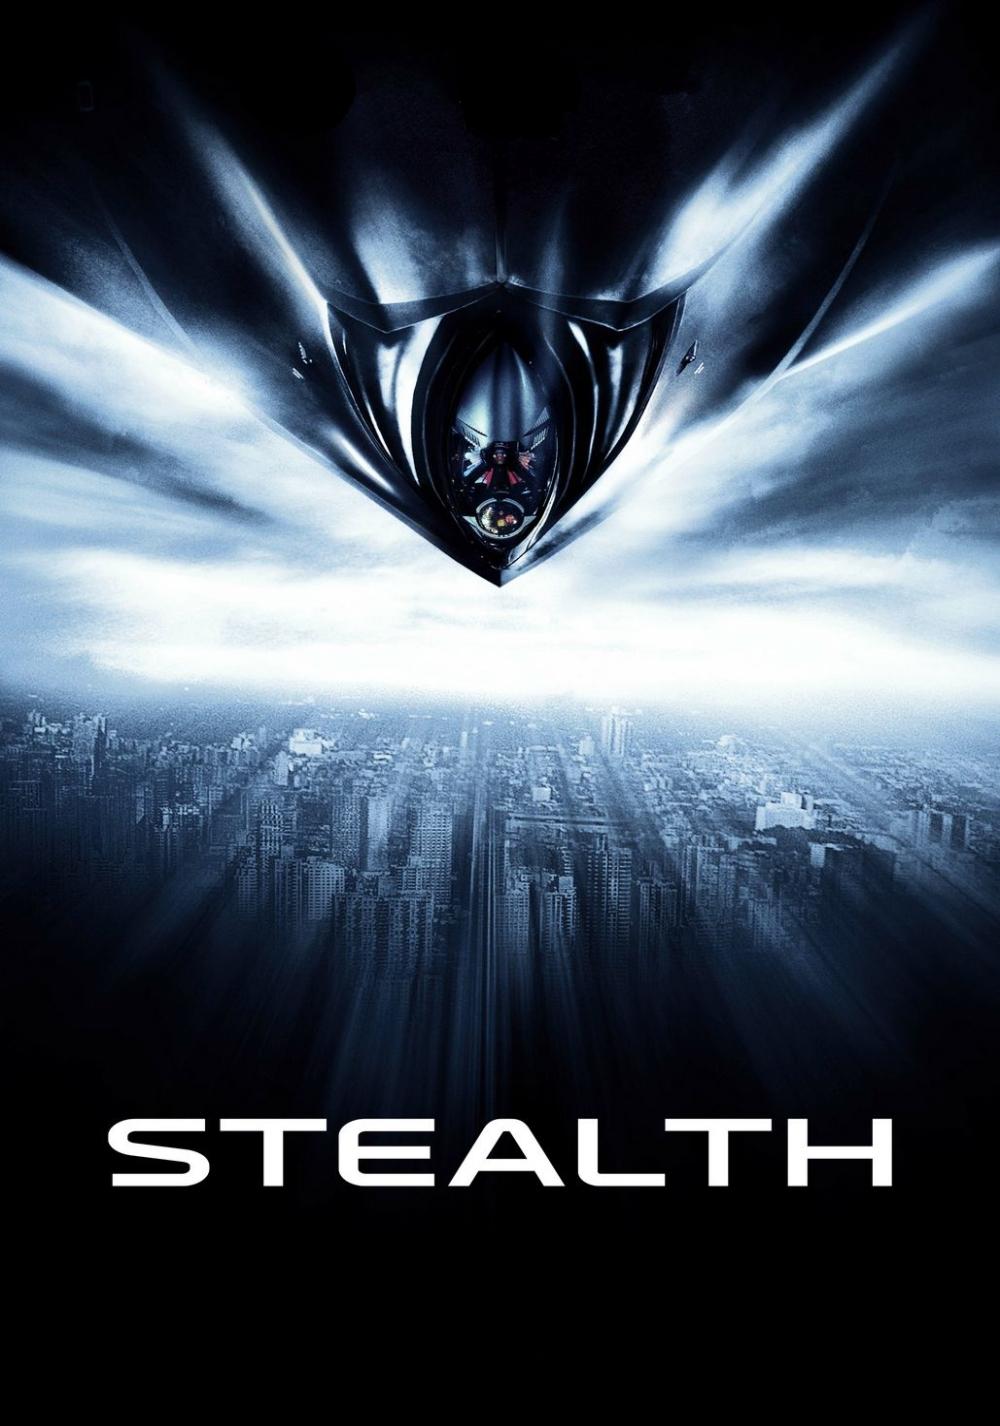 stealth film